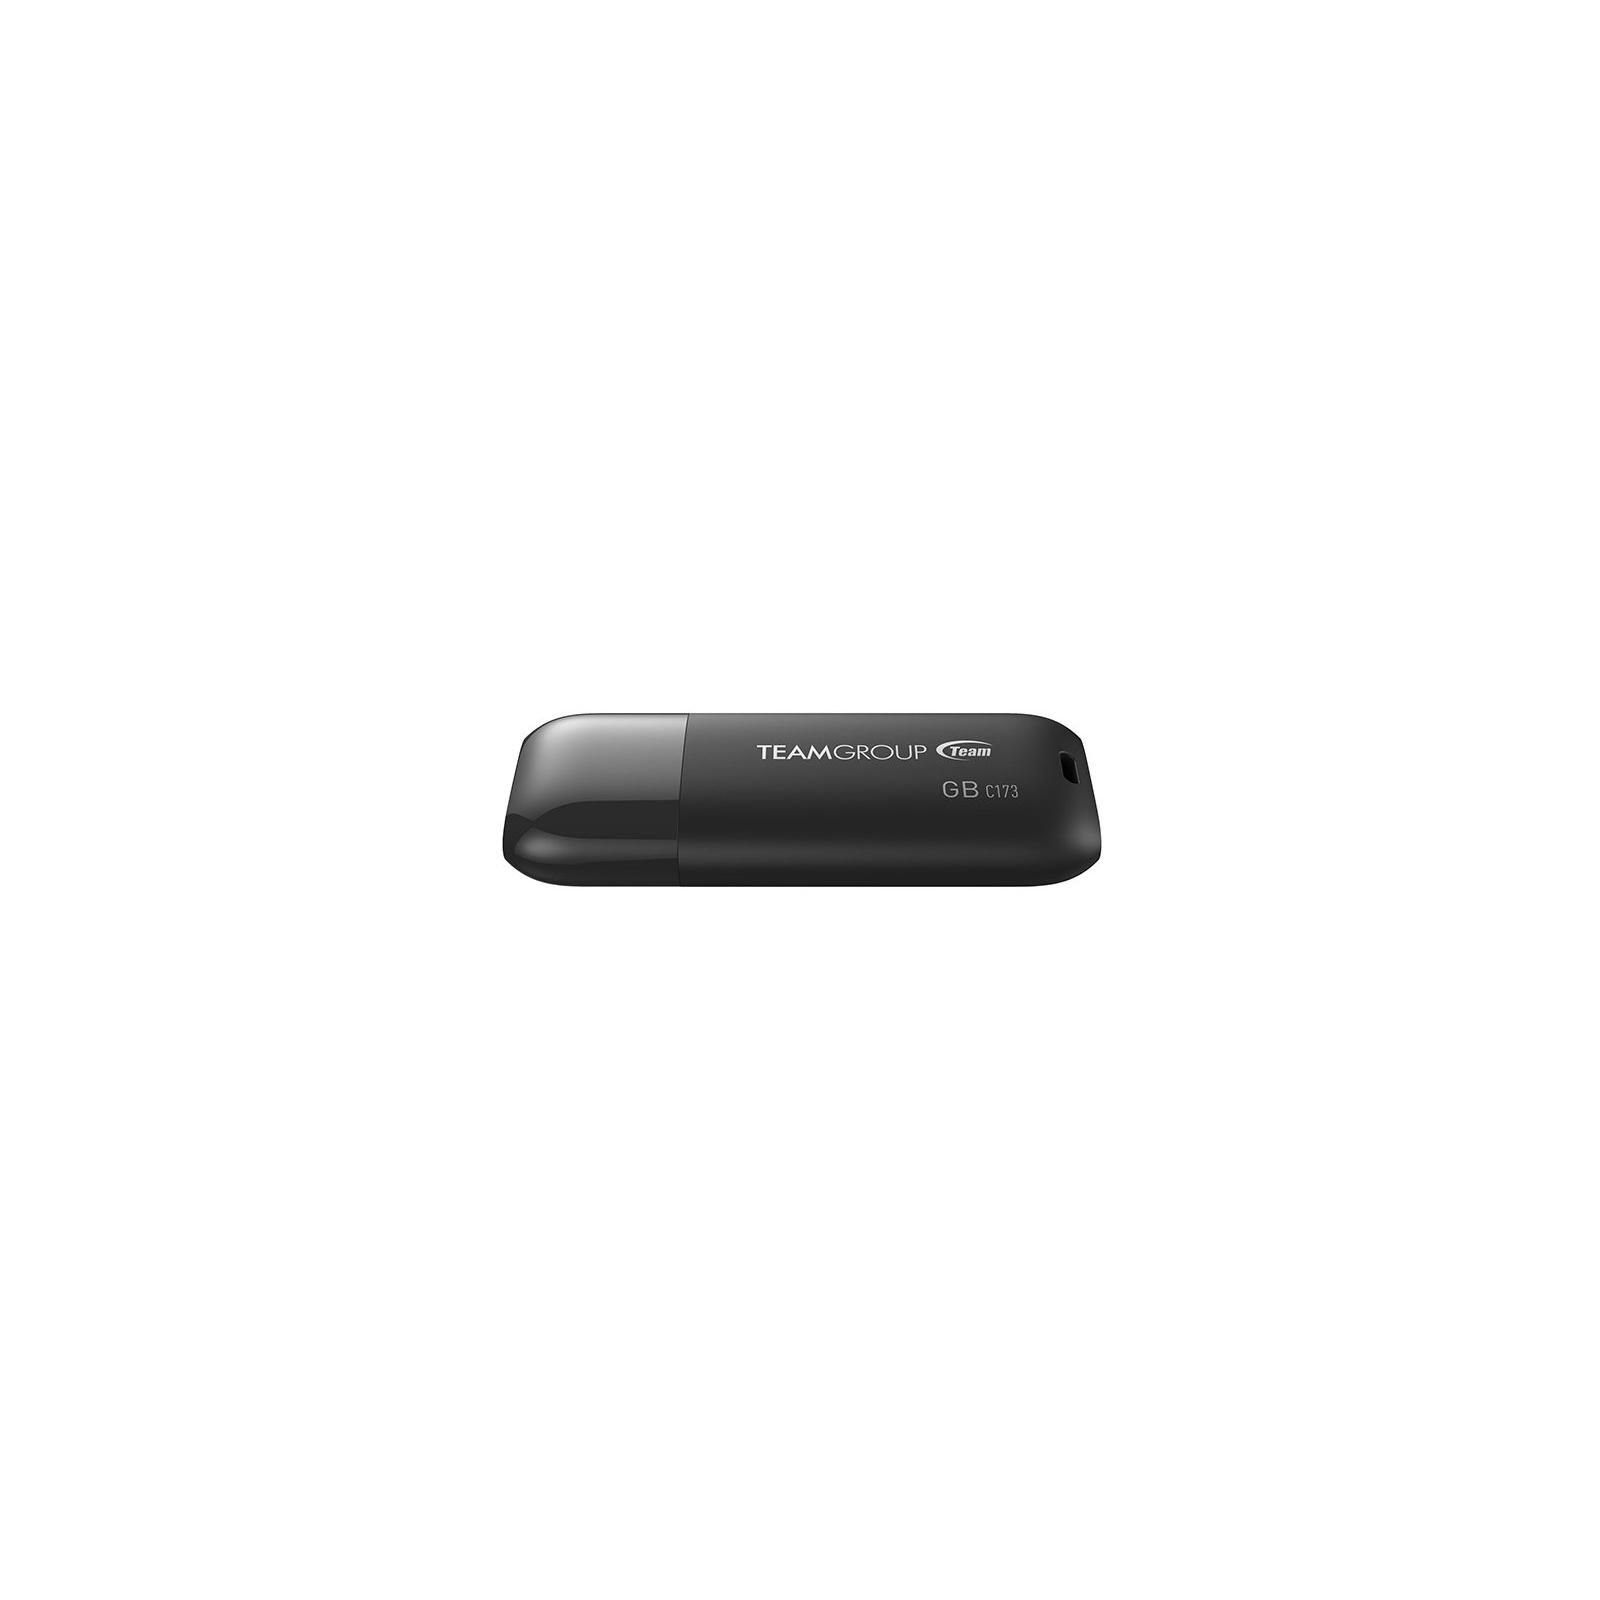 USB флеш накопитель Team 32GB C173 Pearl Black USB 2.0 (TC17332GB01) изображение 2